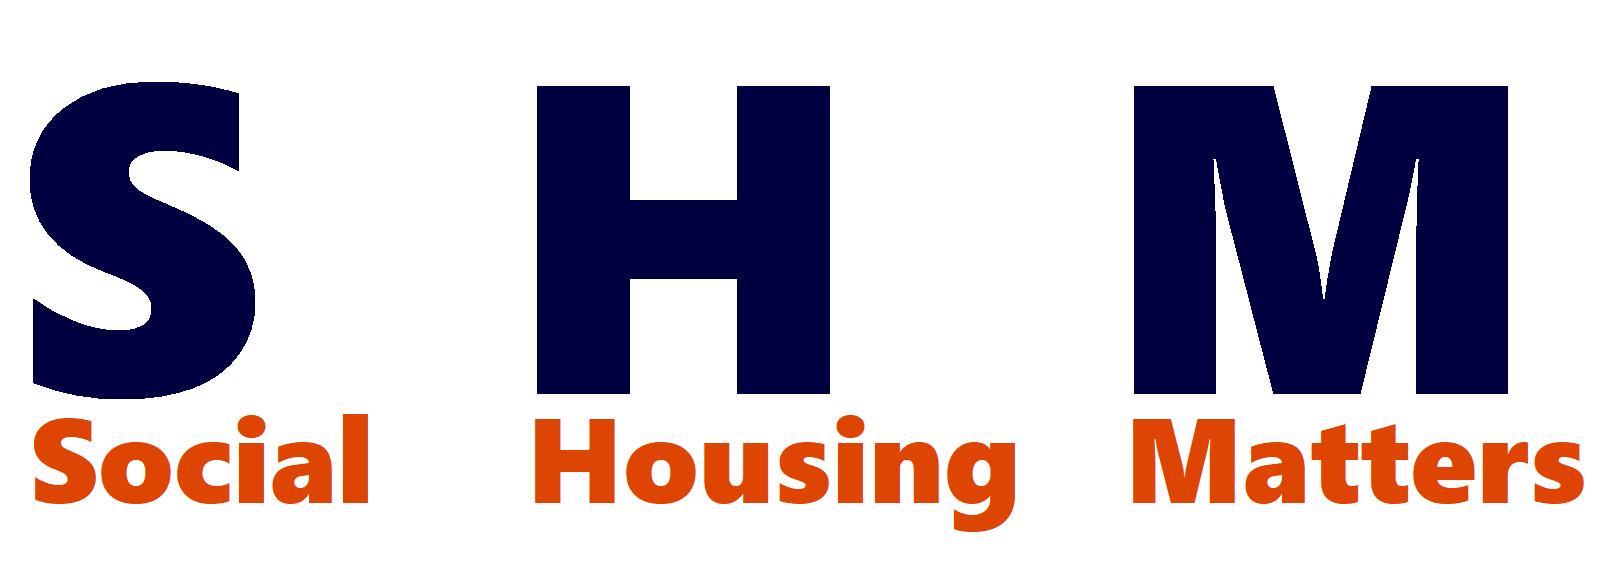 social housing matters logo